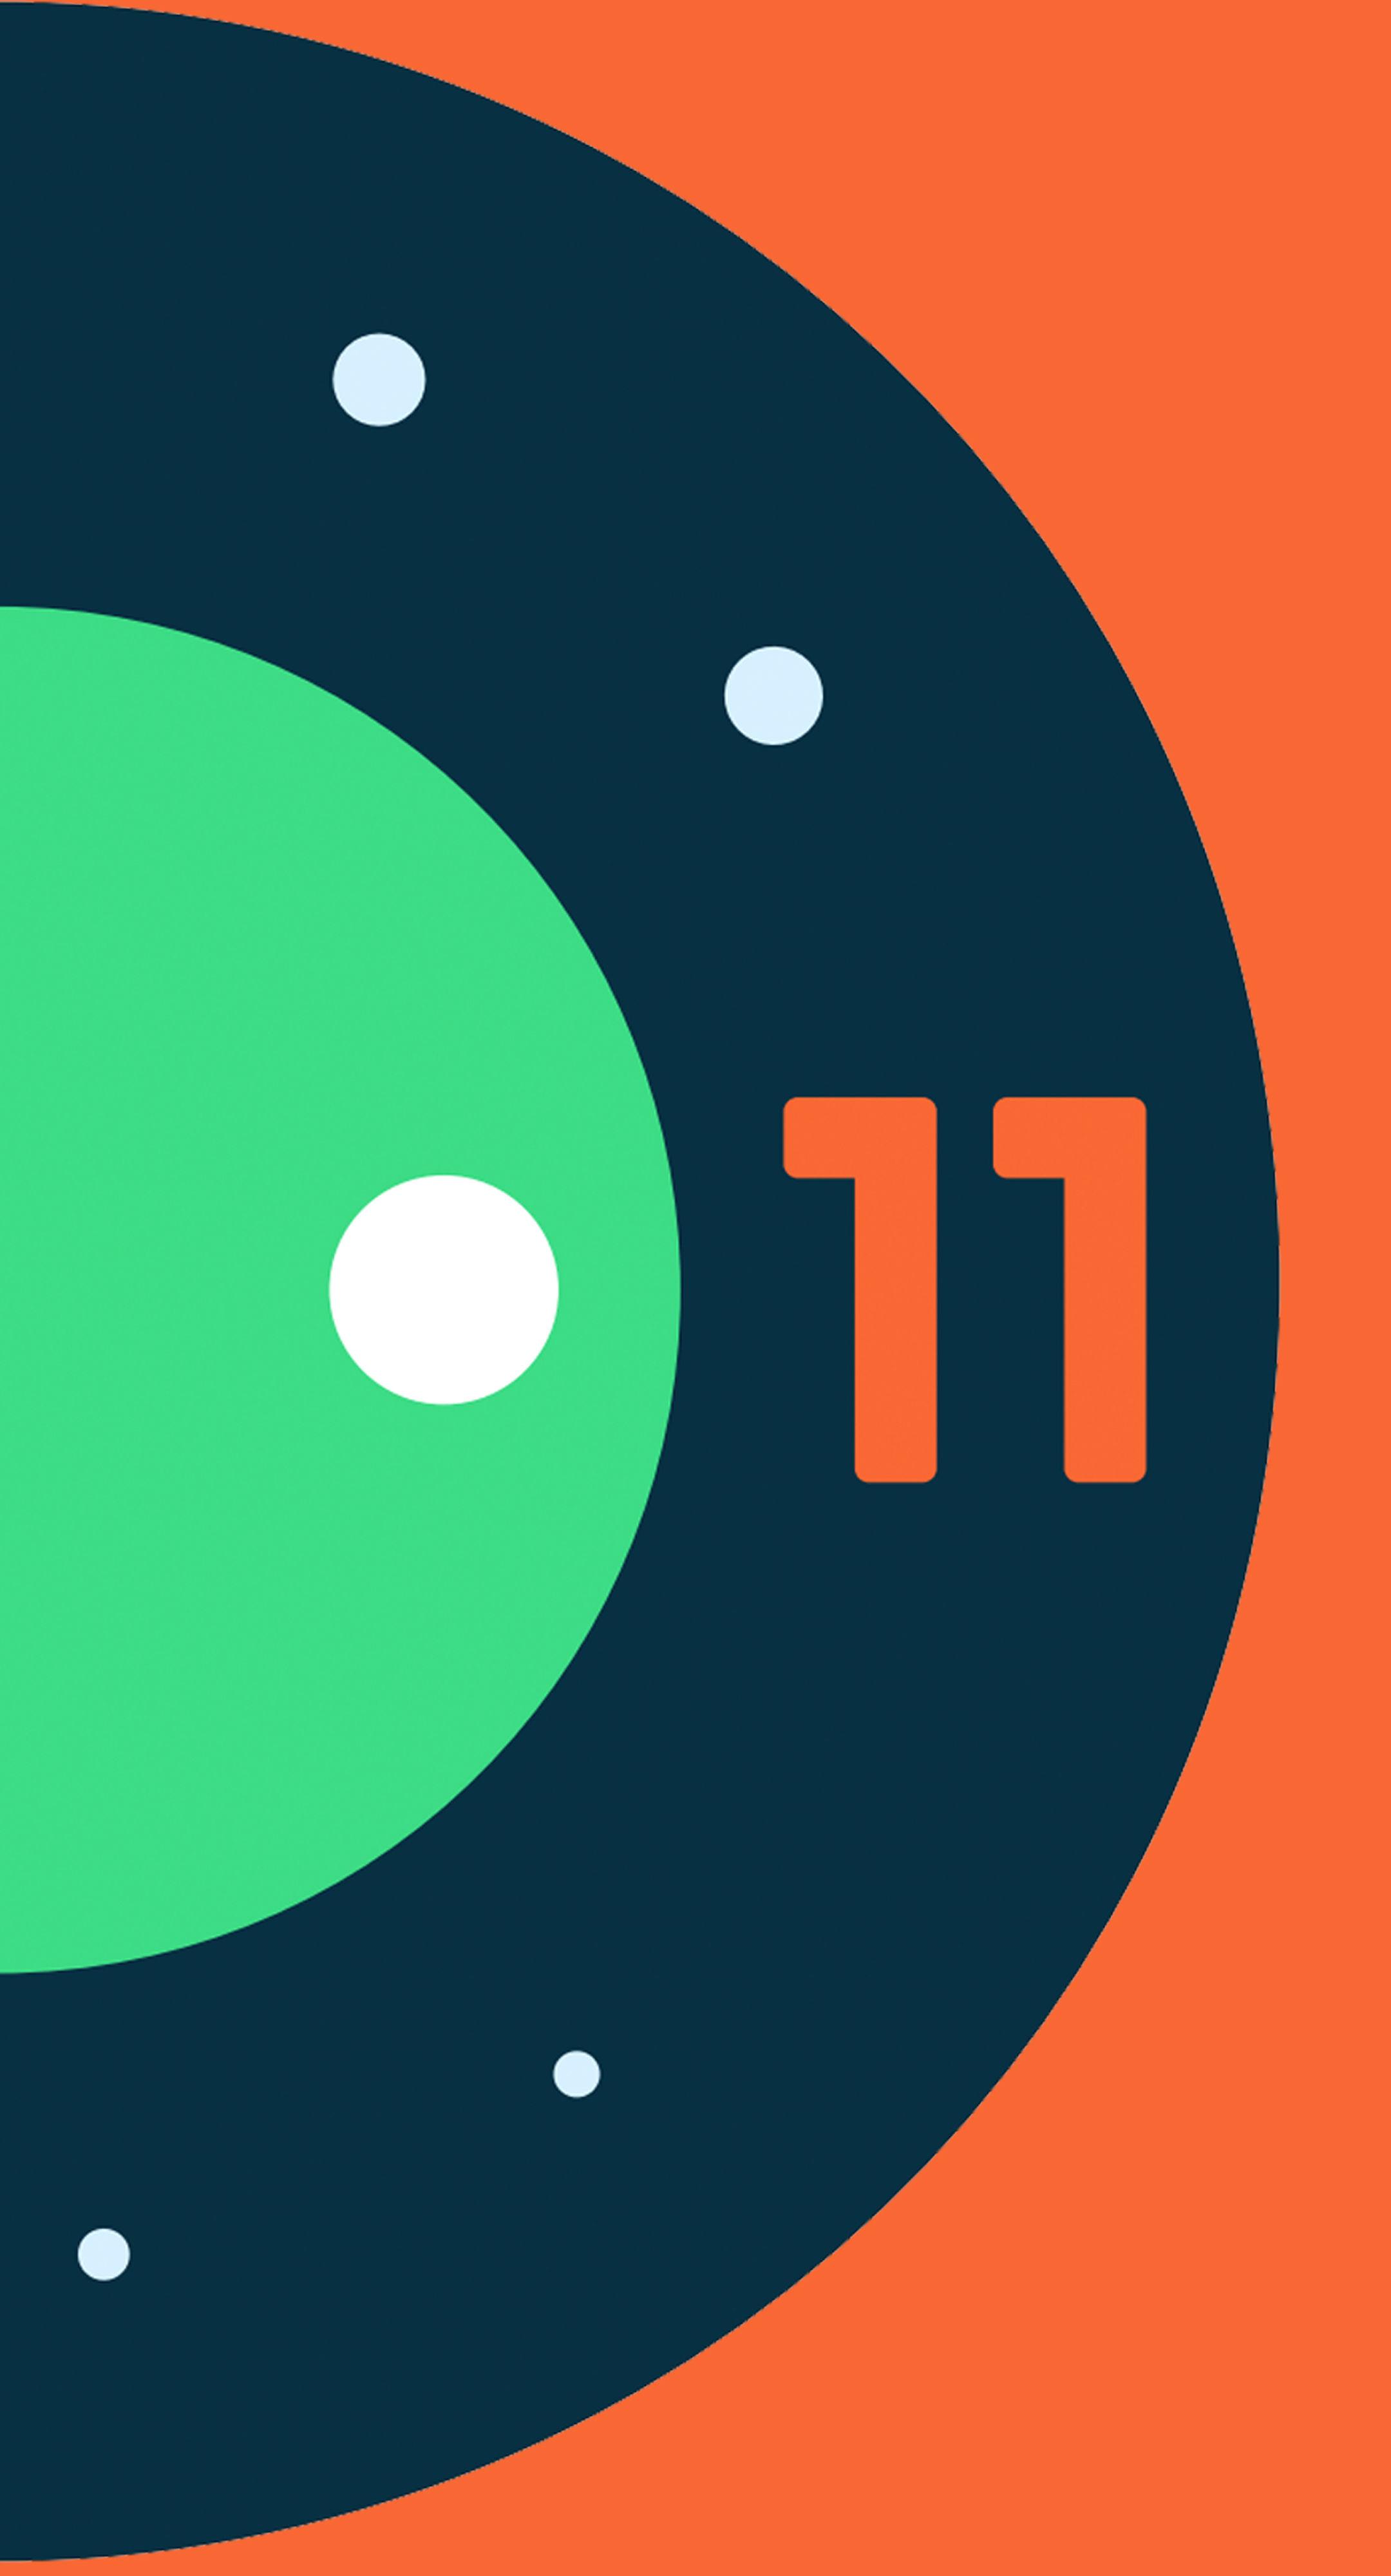 android-11-logo-orange